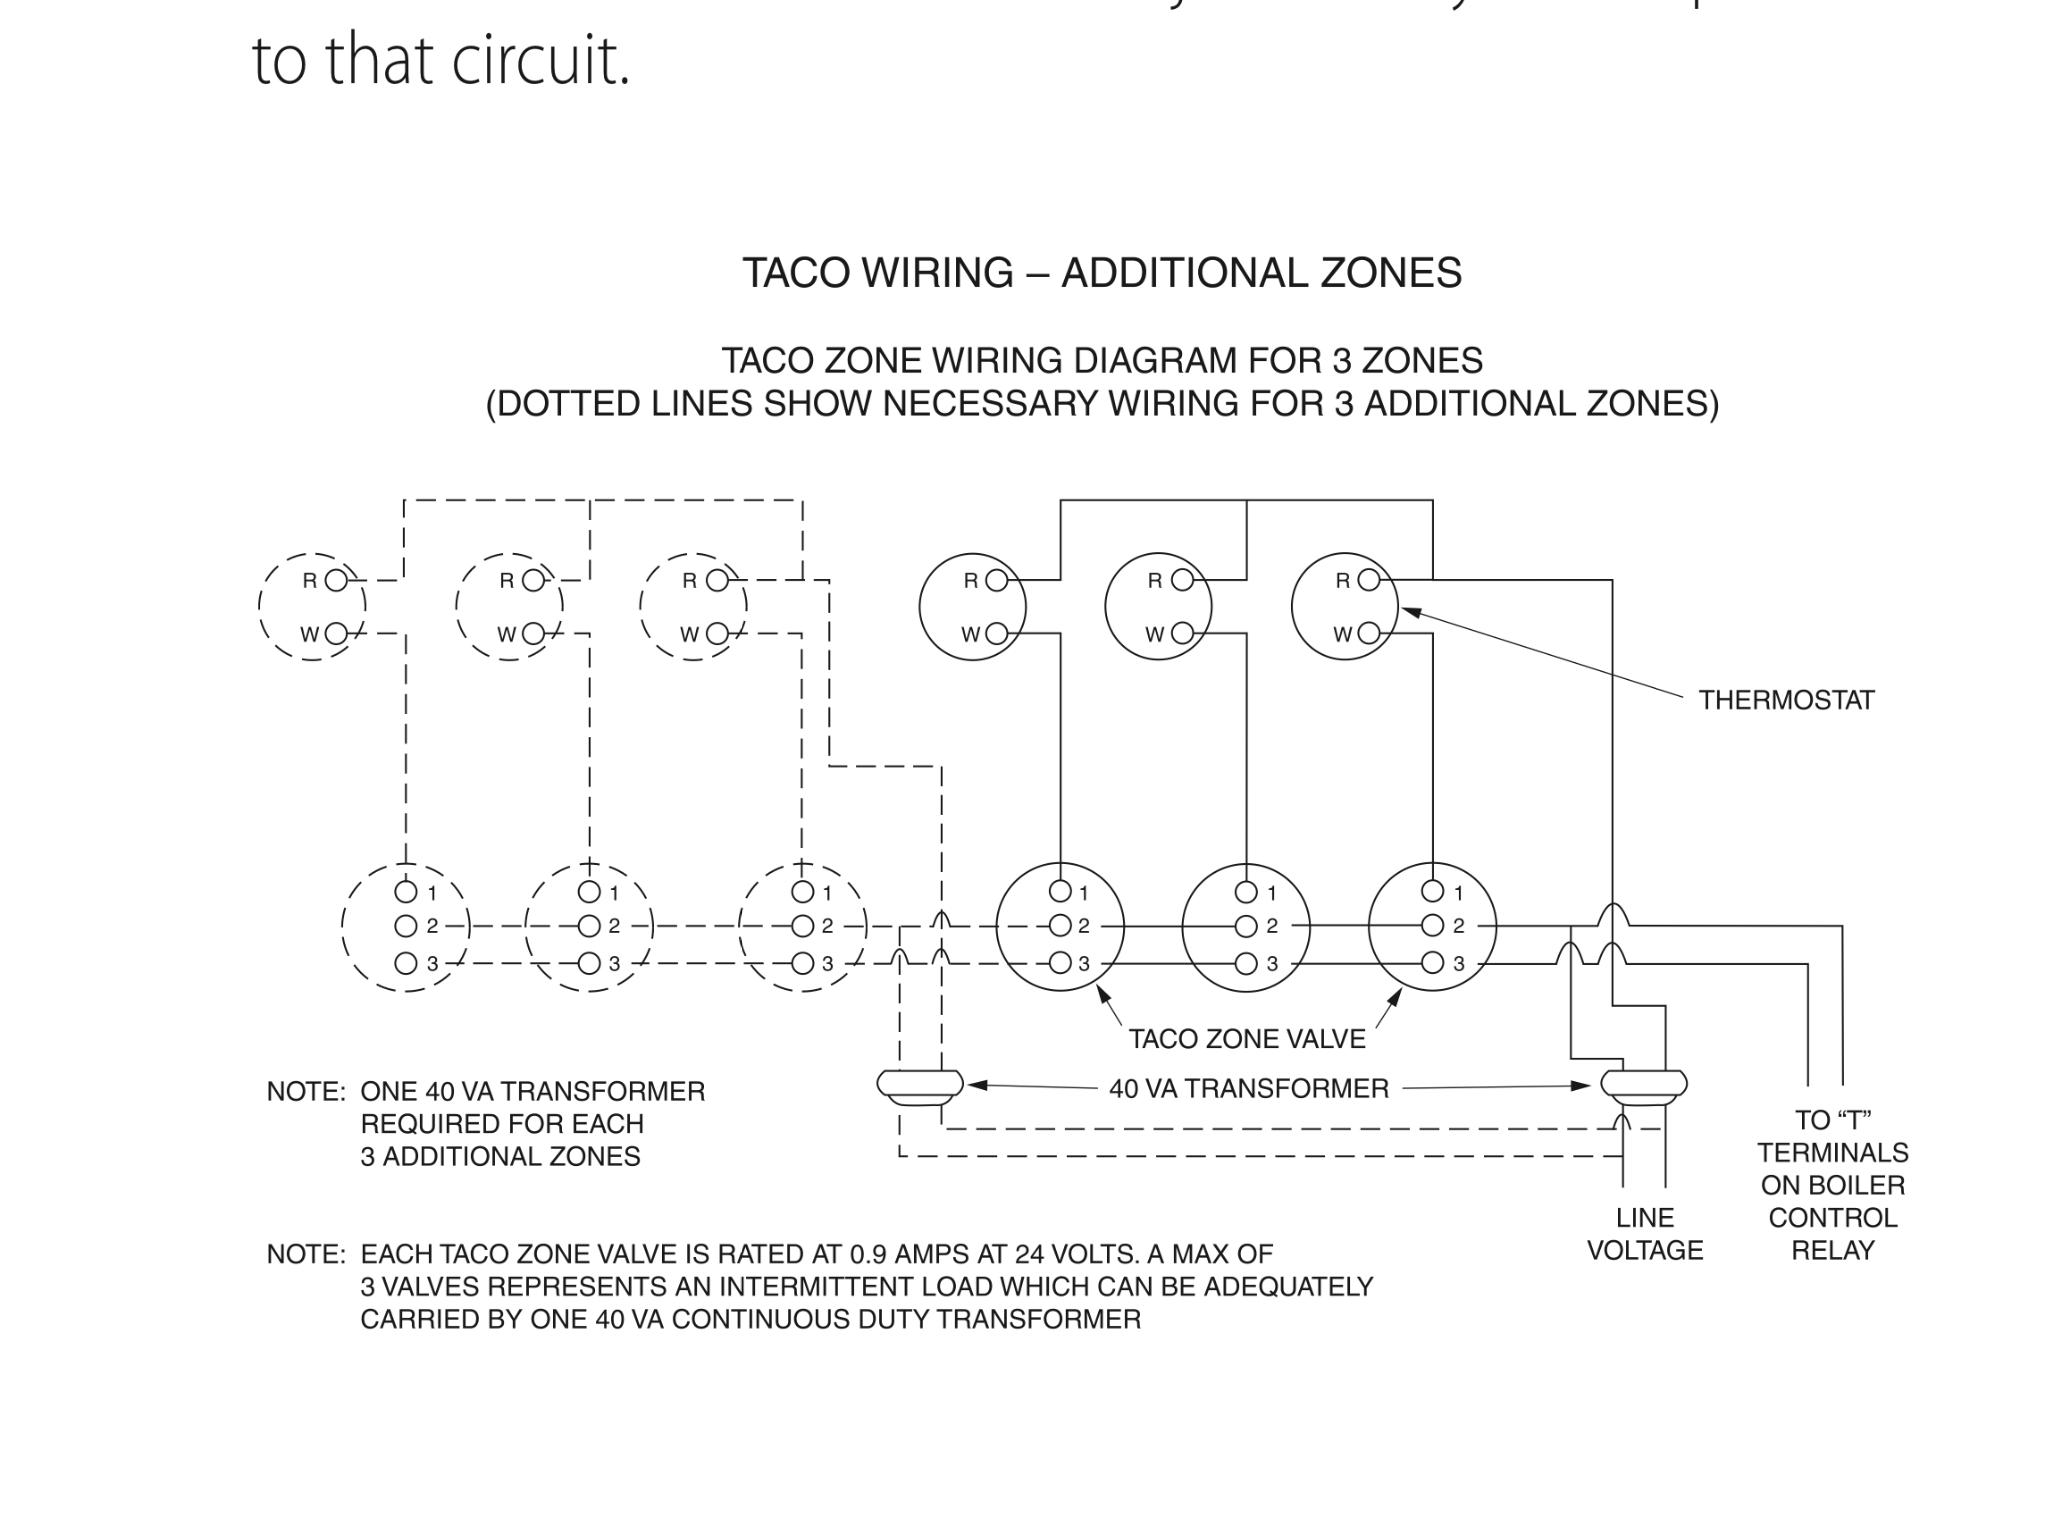 2 Thermostat 2 Zone Valve Wiring